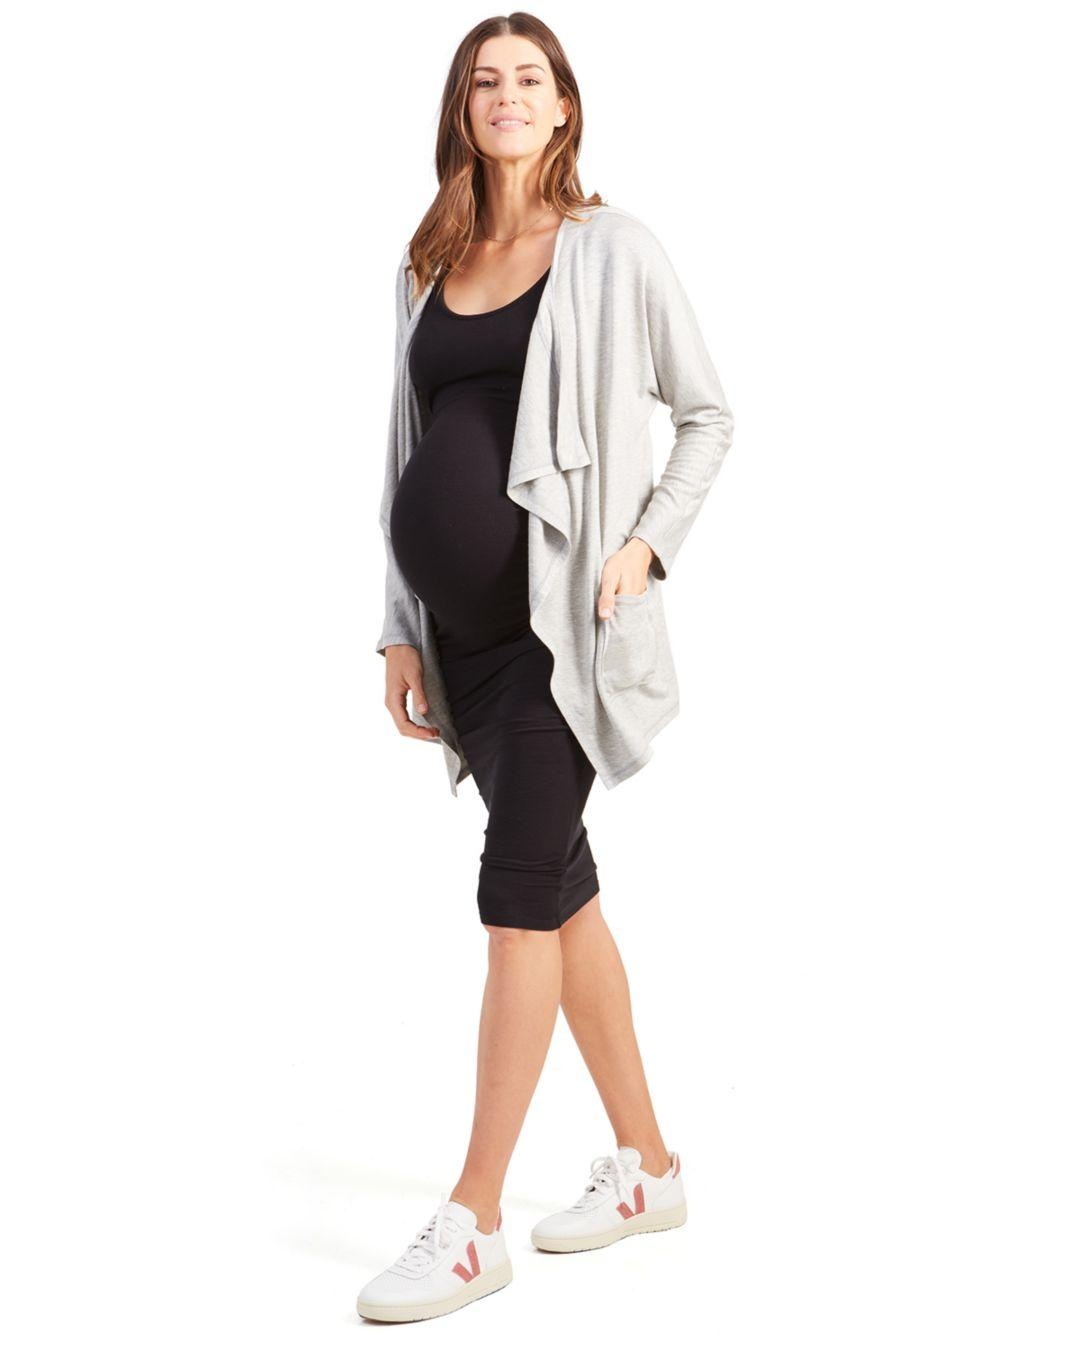 c761ae3a4f2 Lyst - Ingrid & Isabel Maternity Cozy Nursing Cardigan in Gray